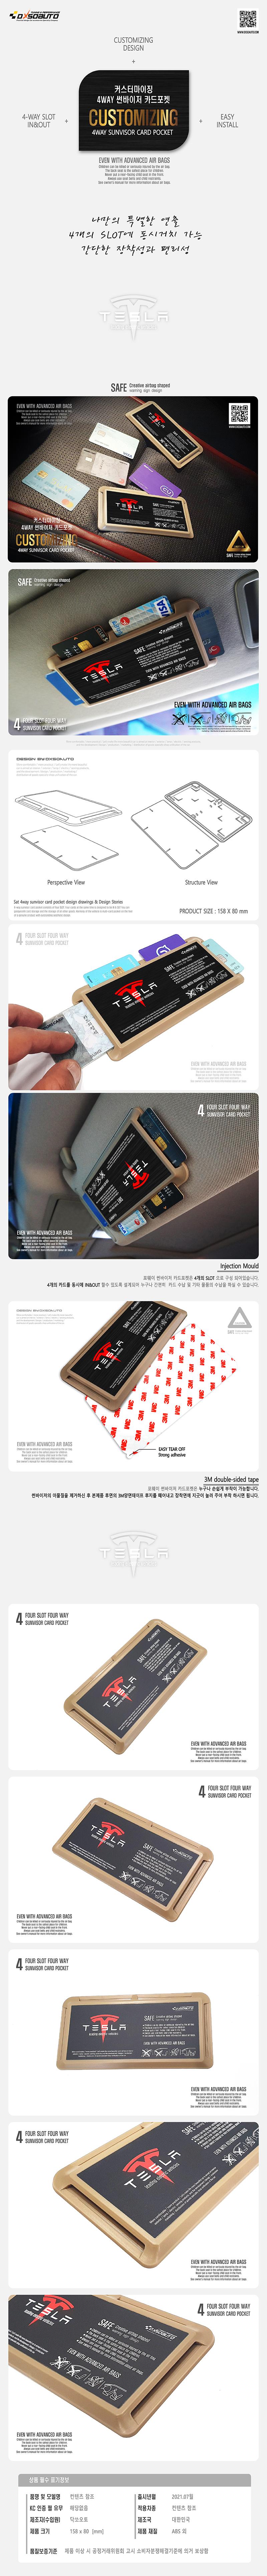 [DXSOAUTO] 커스터마이징 4WAY 썬바이저 카드포켓 (1EA / 1SET) 테슬라 베이지